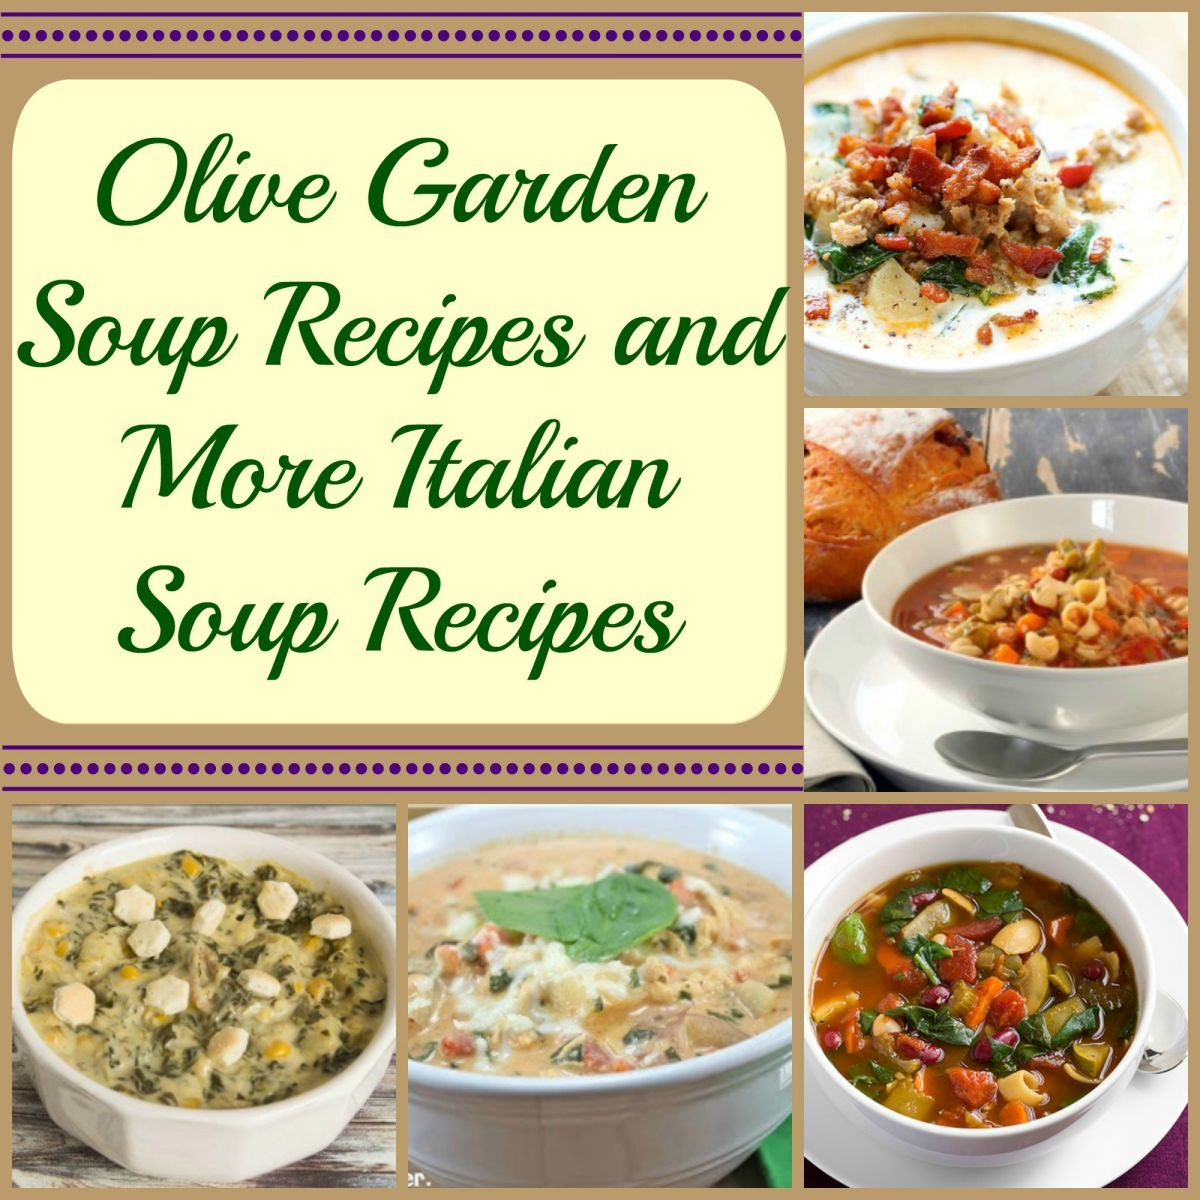 11 Olive Garden Soup Recipes Olive garden copycat